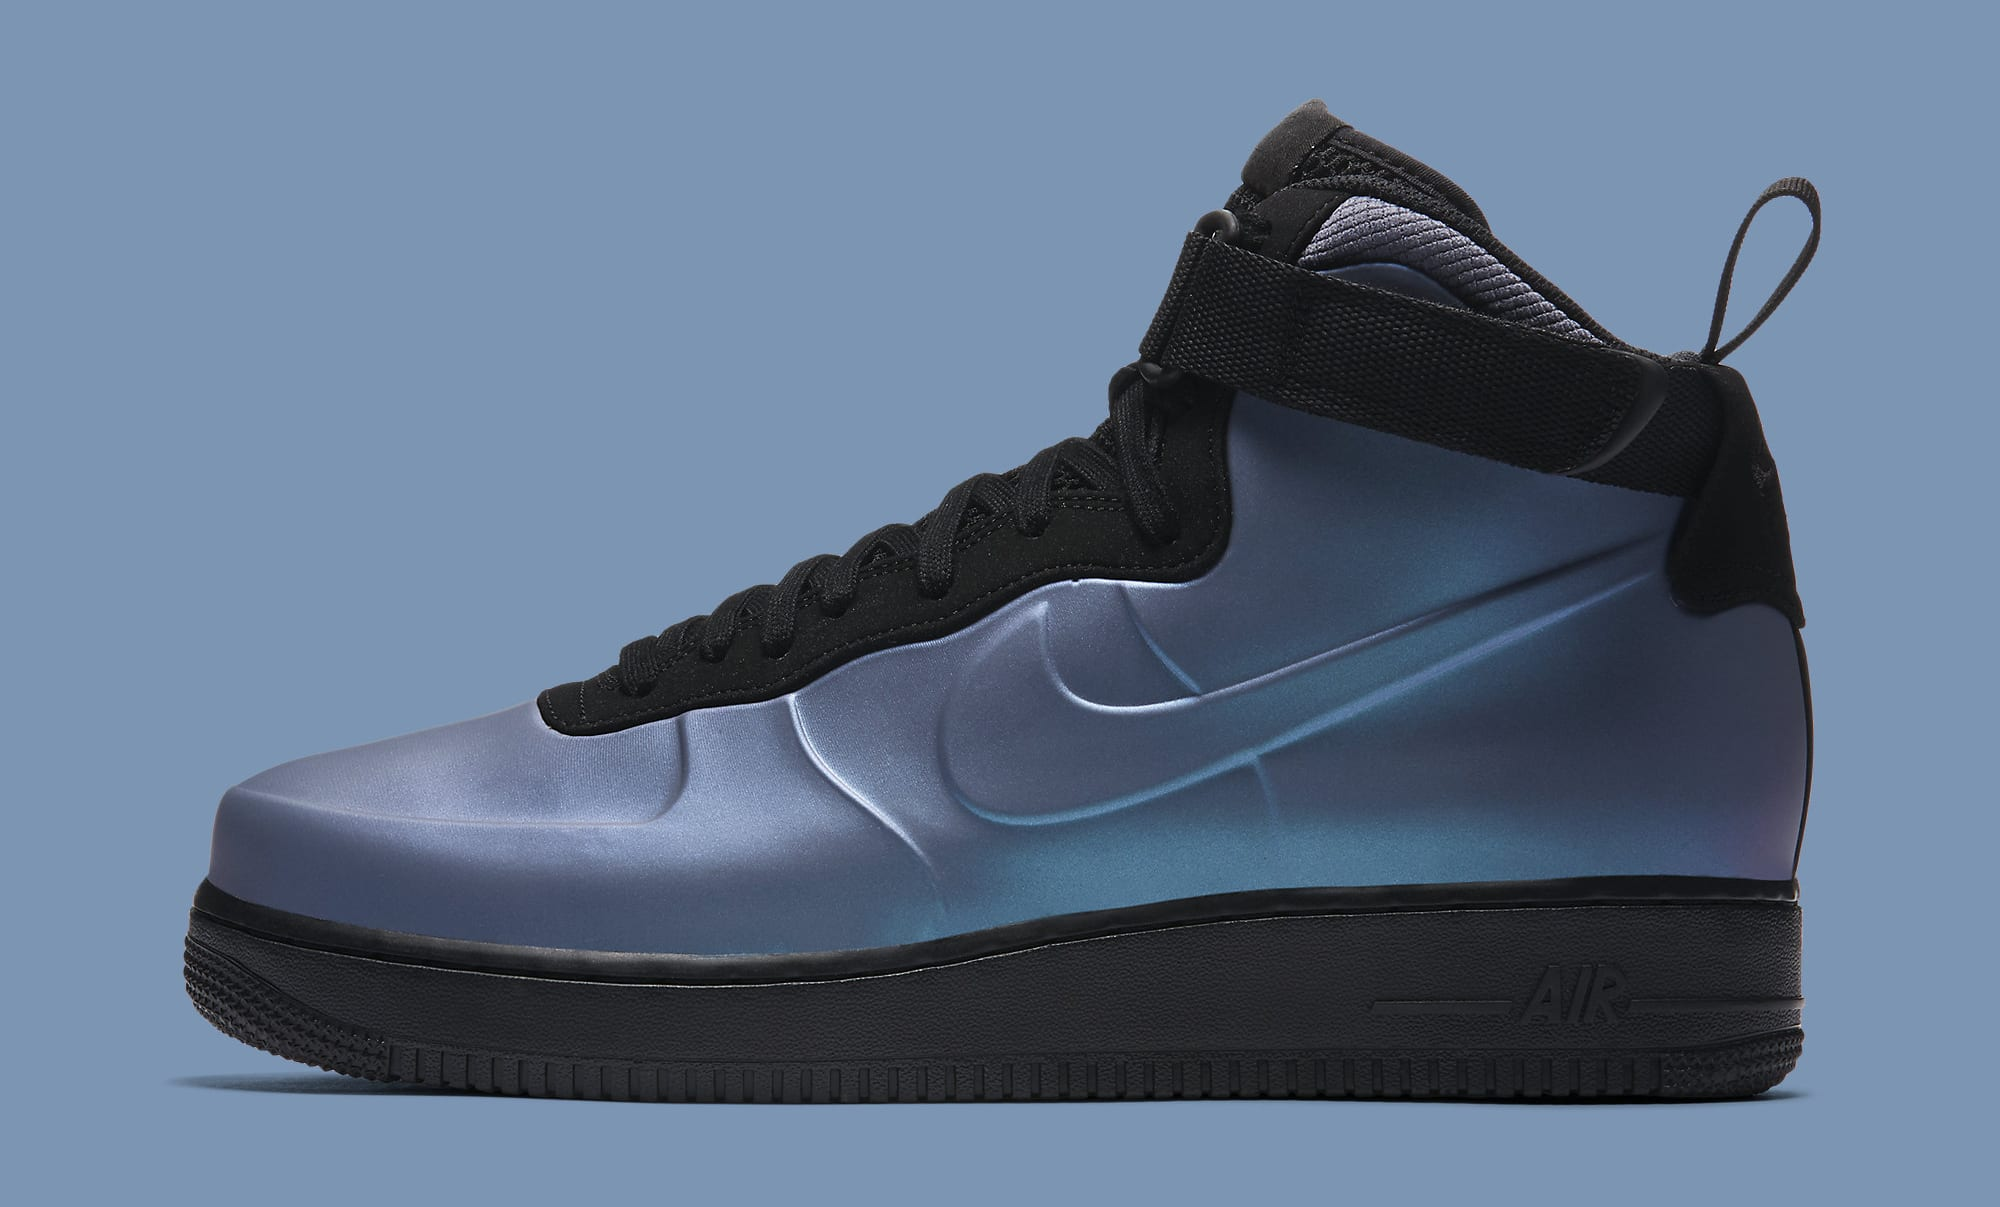 Nike Air Force 1 Foamposite Light Carbon AH6771-002 Profile